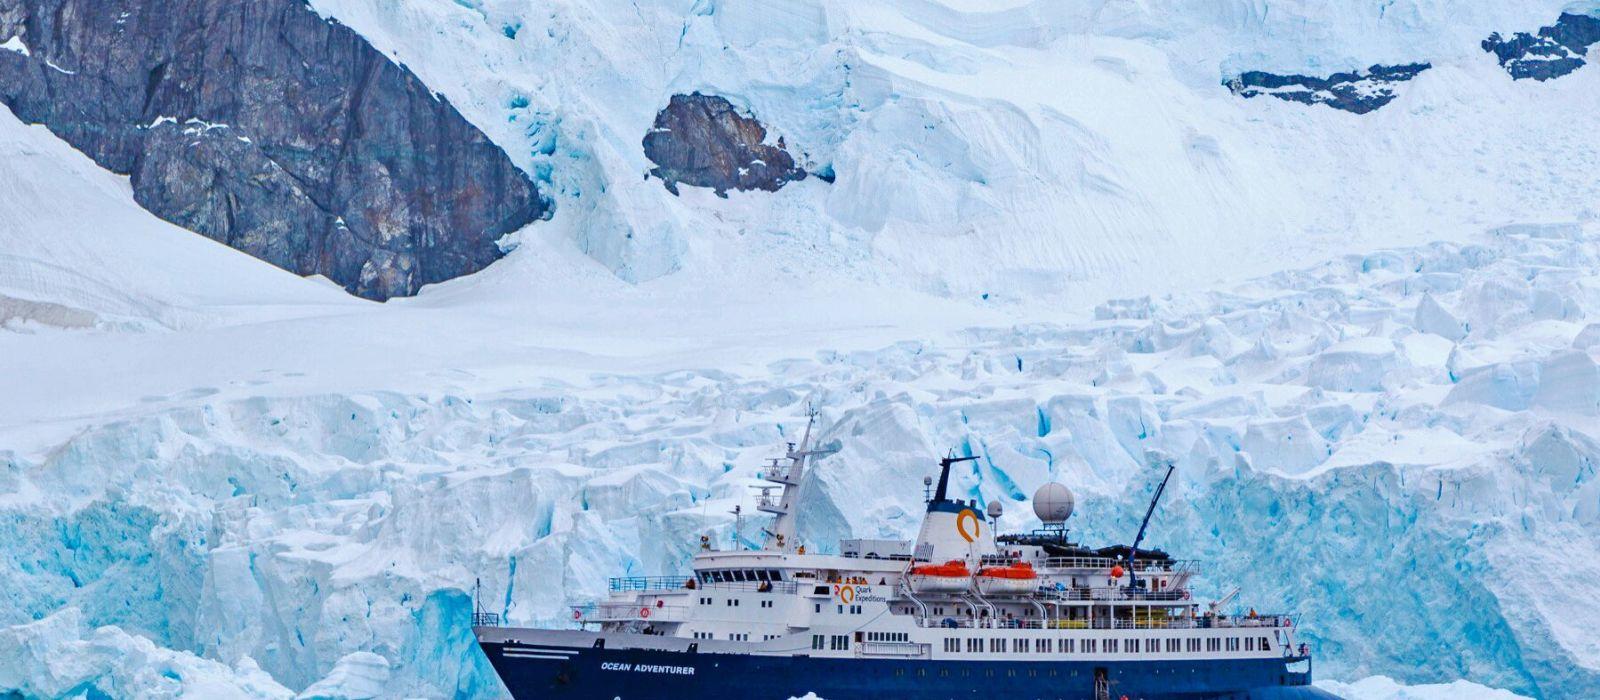 Hotel Ocean Adventurer by Quark Expeditions, Antarctica Antarctica